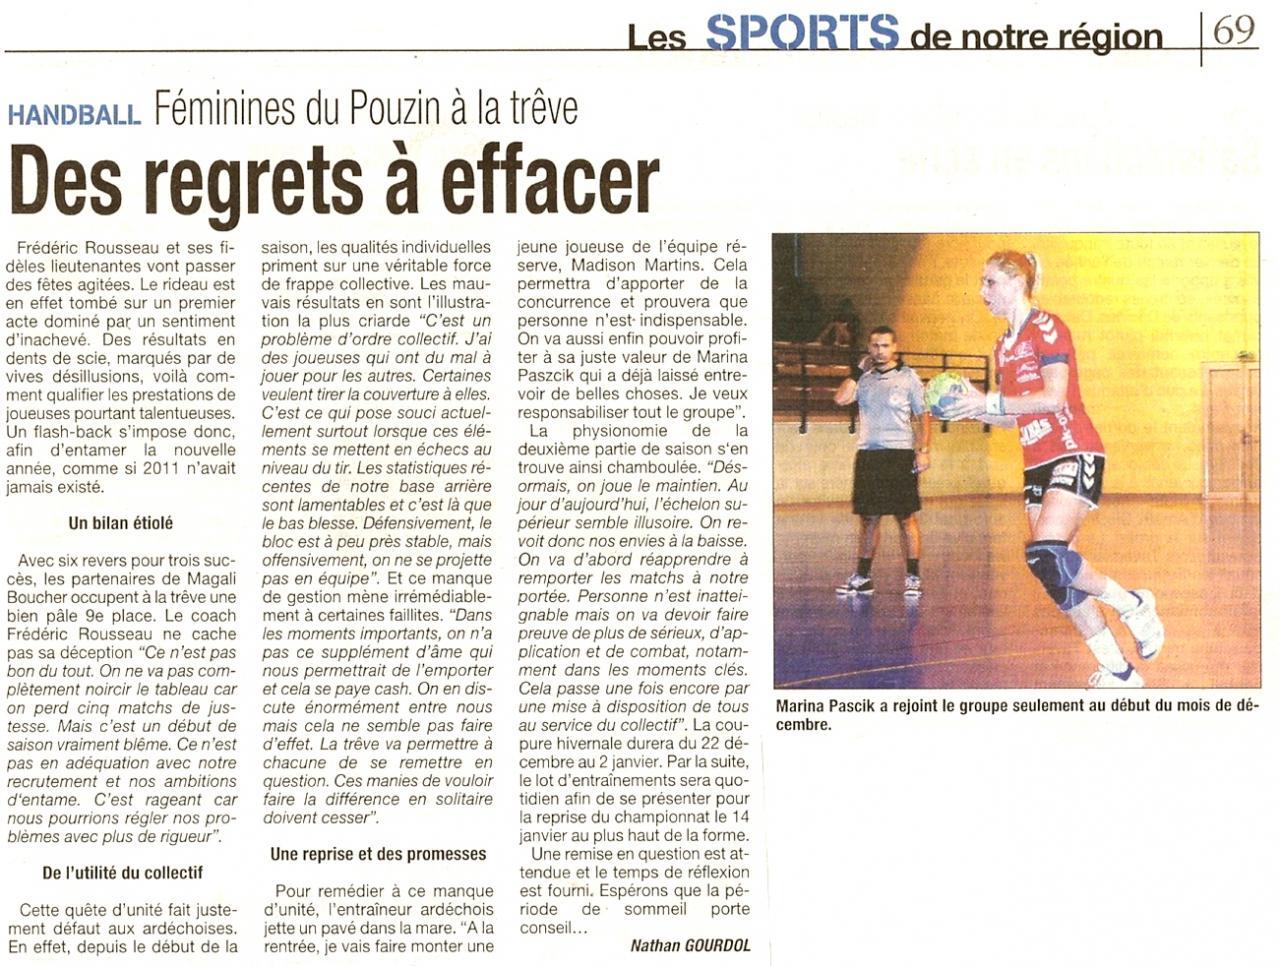 tribune-sports-22-12-2011.jpg